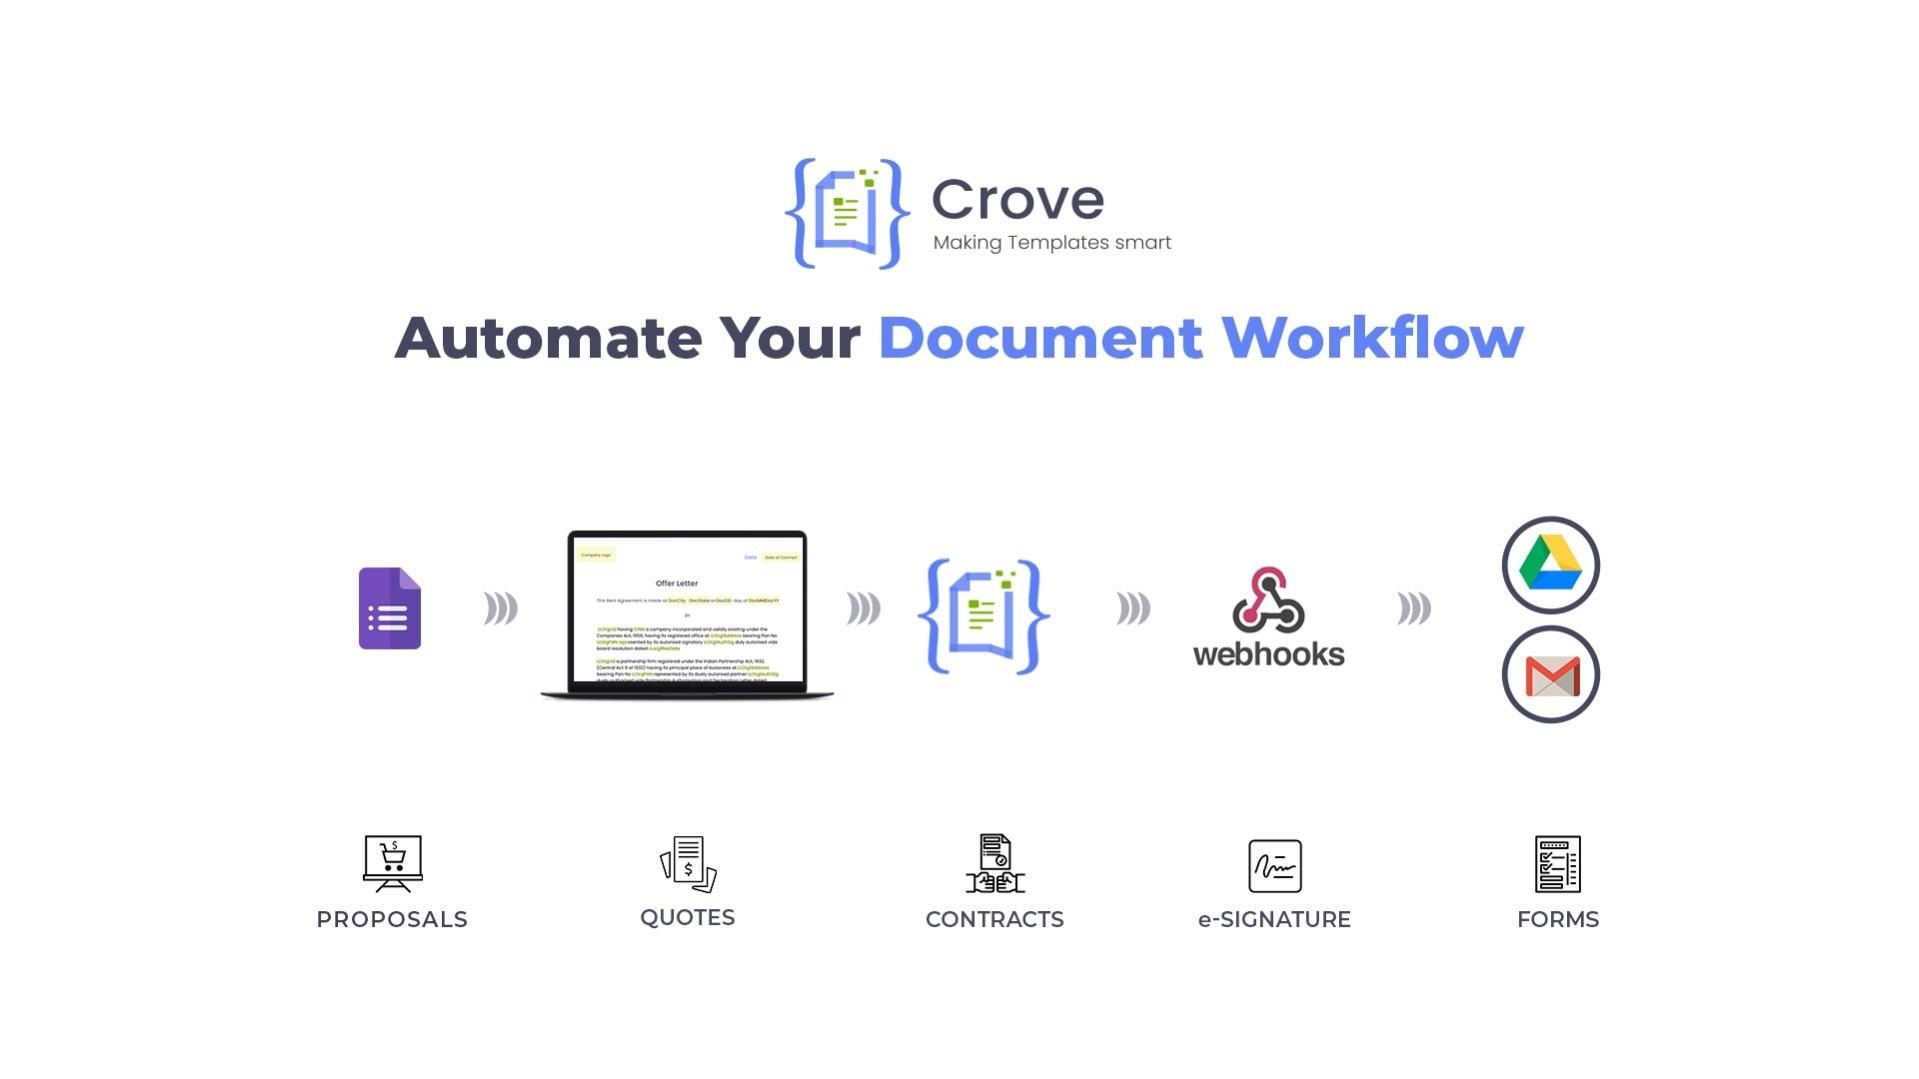 Crove App Lifetime Deal-Pay Once & Never Again